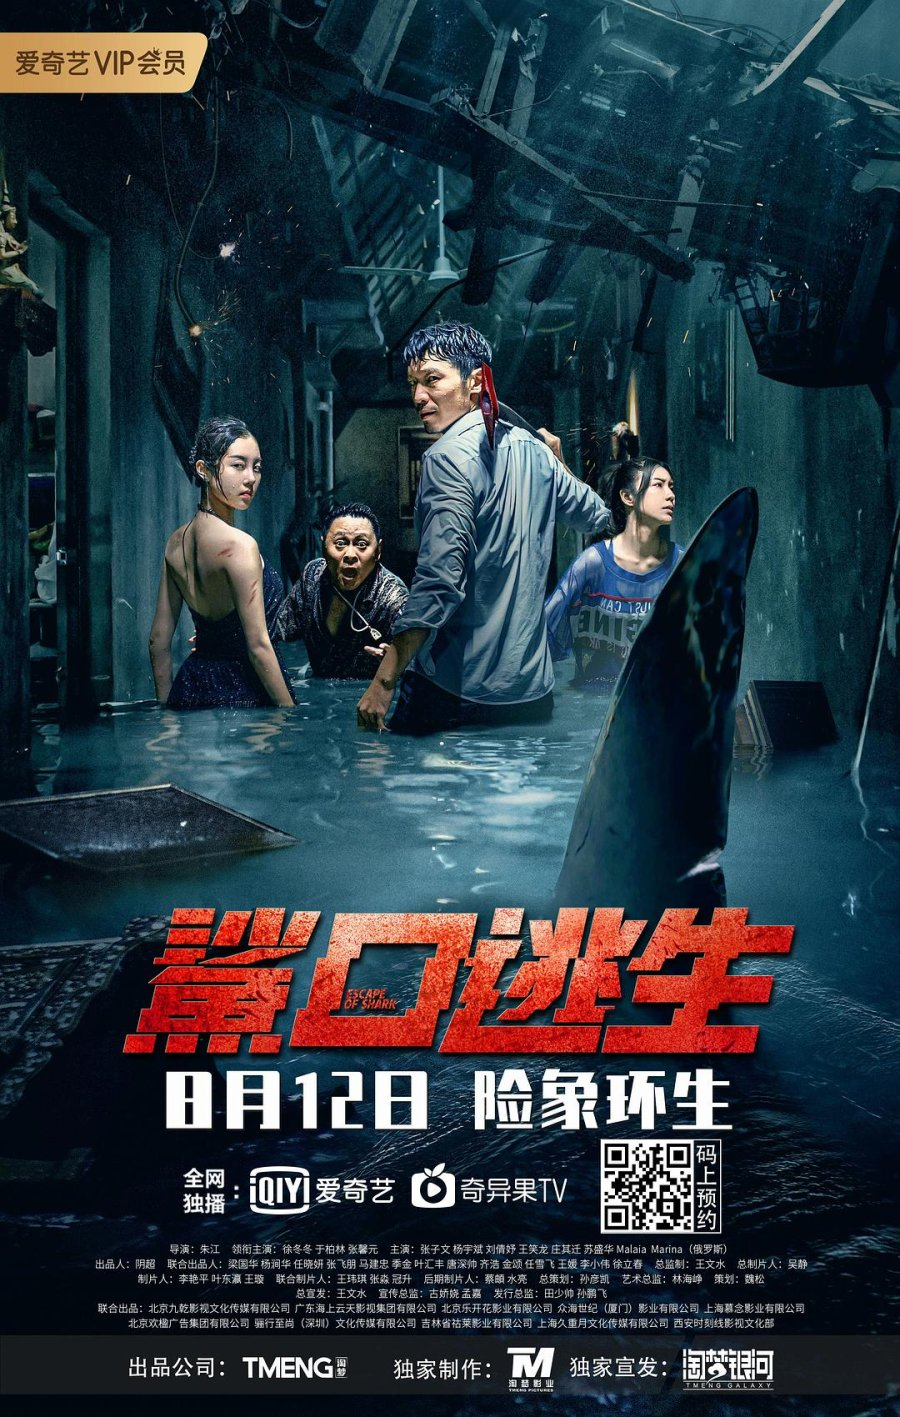 Escape of Shark (2021) Full Movie [In Mandarin] With Hindi Subtitles | WebRip 720p [1XBET]